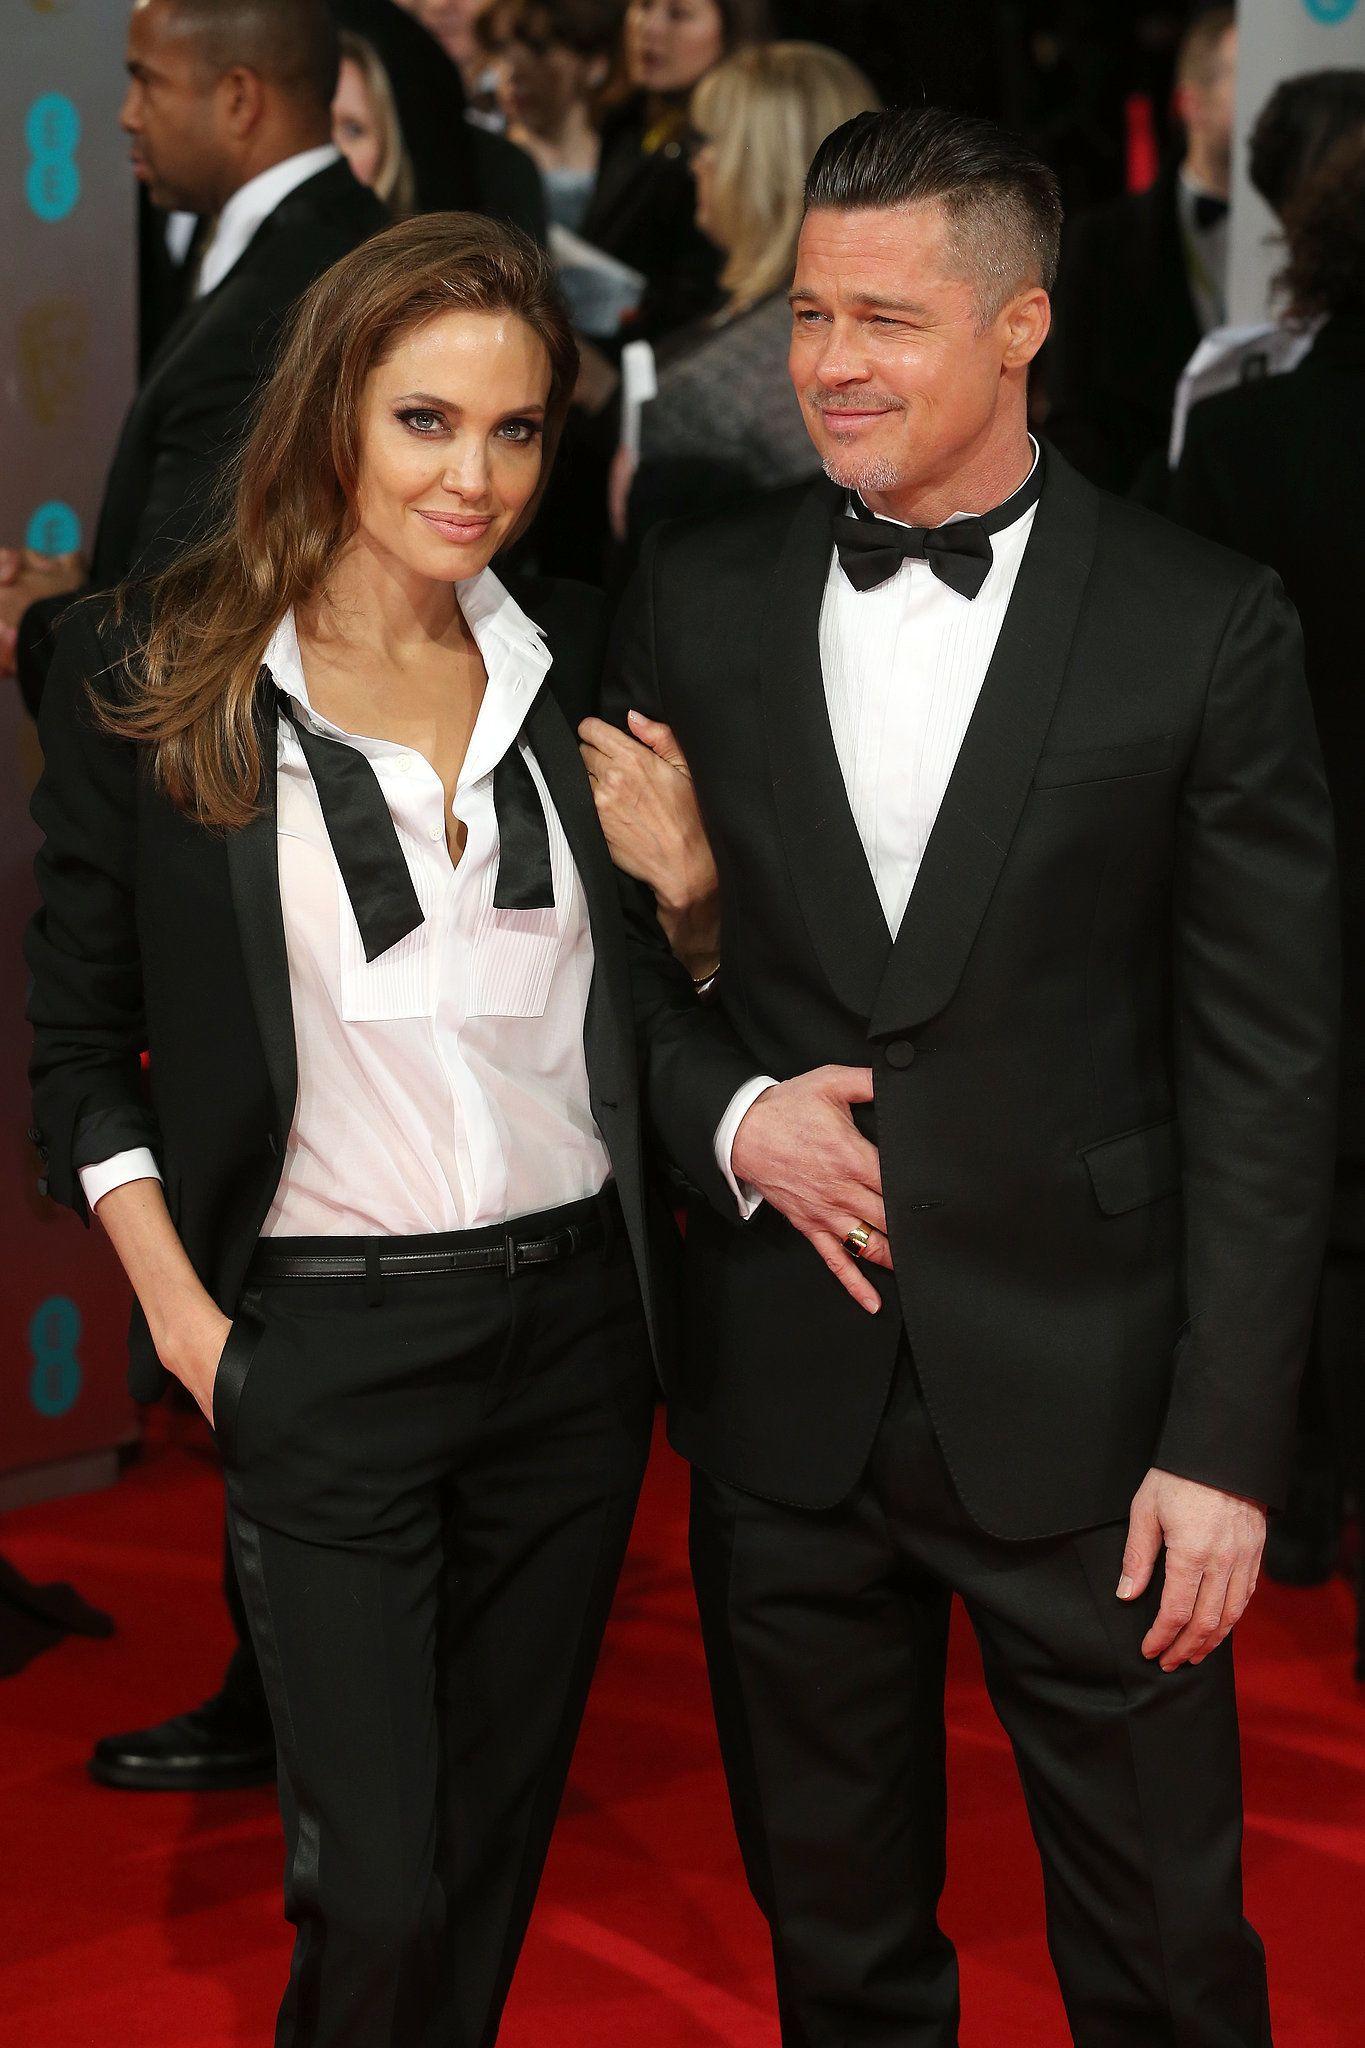 The Matching Moment Brad And Angelina Brad Pitt Brad Pitt And Angelina Jolie